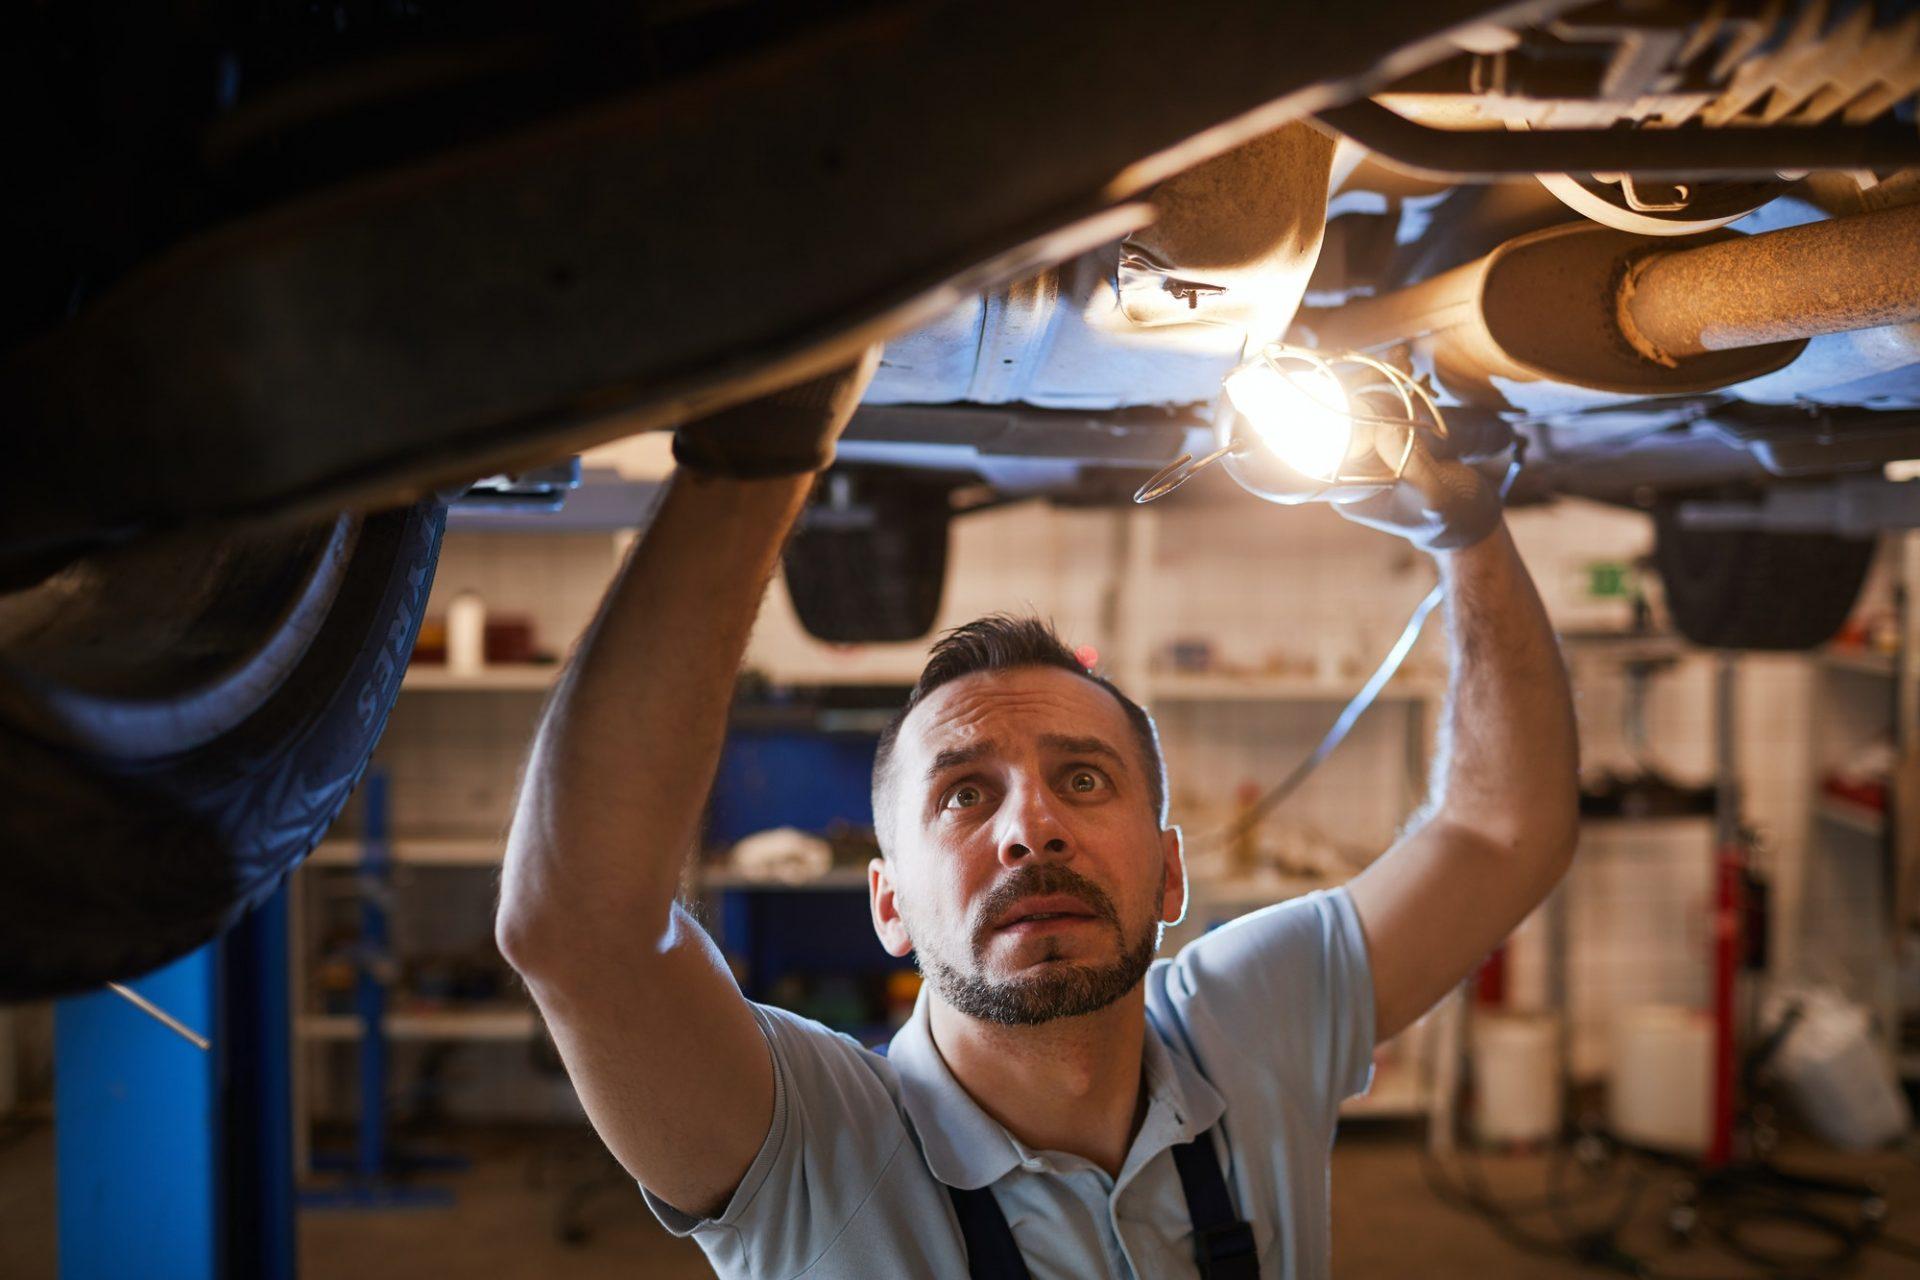 Car Mechanic Working in Garage